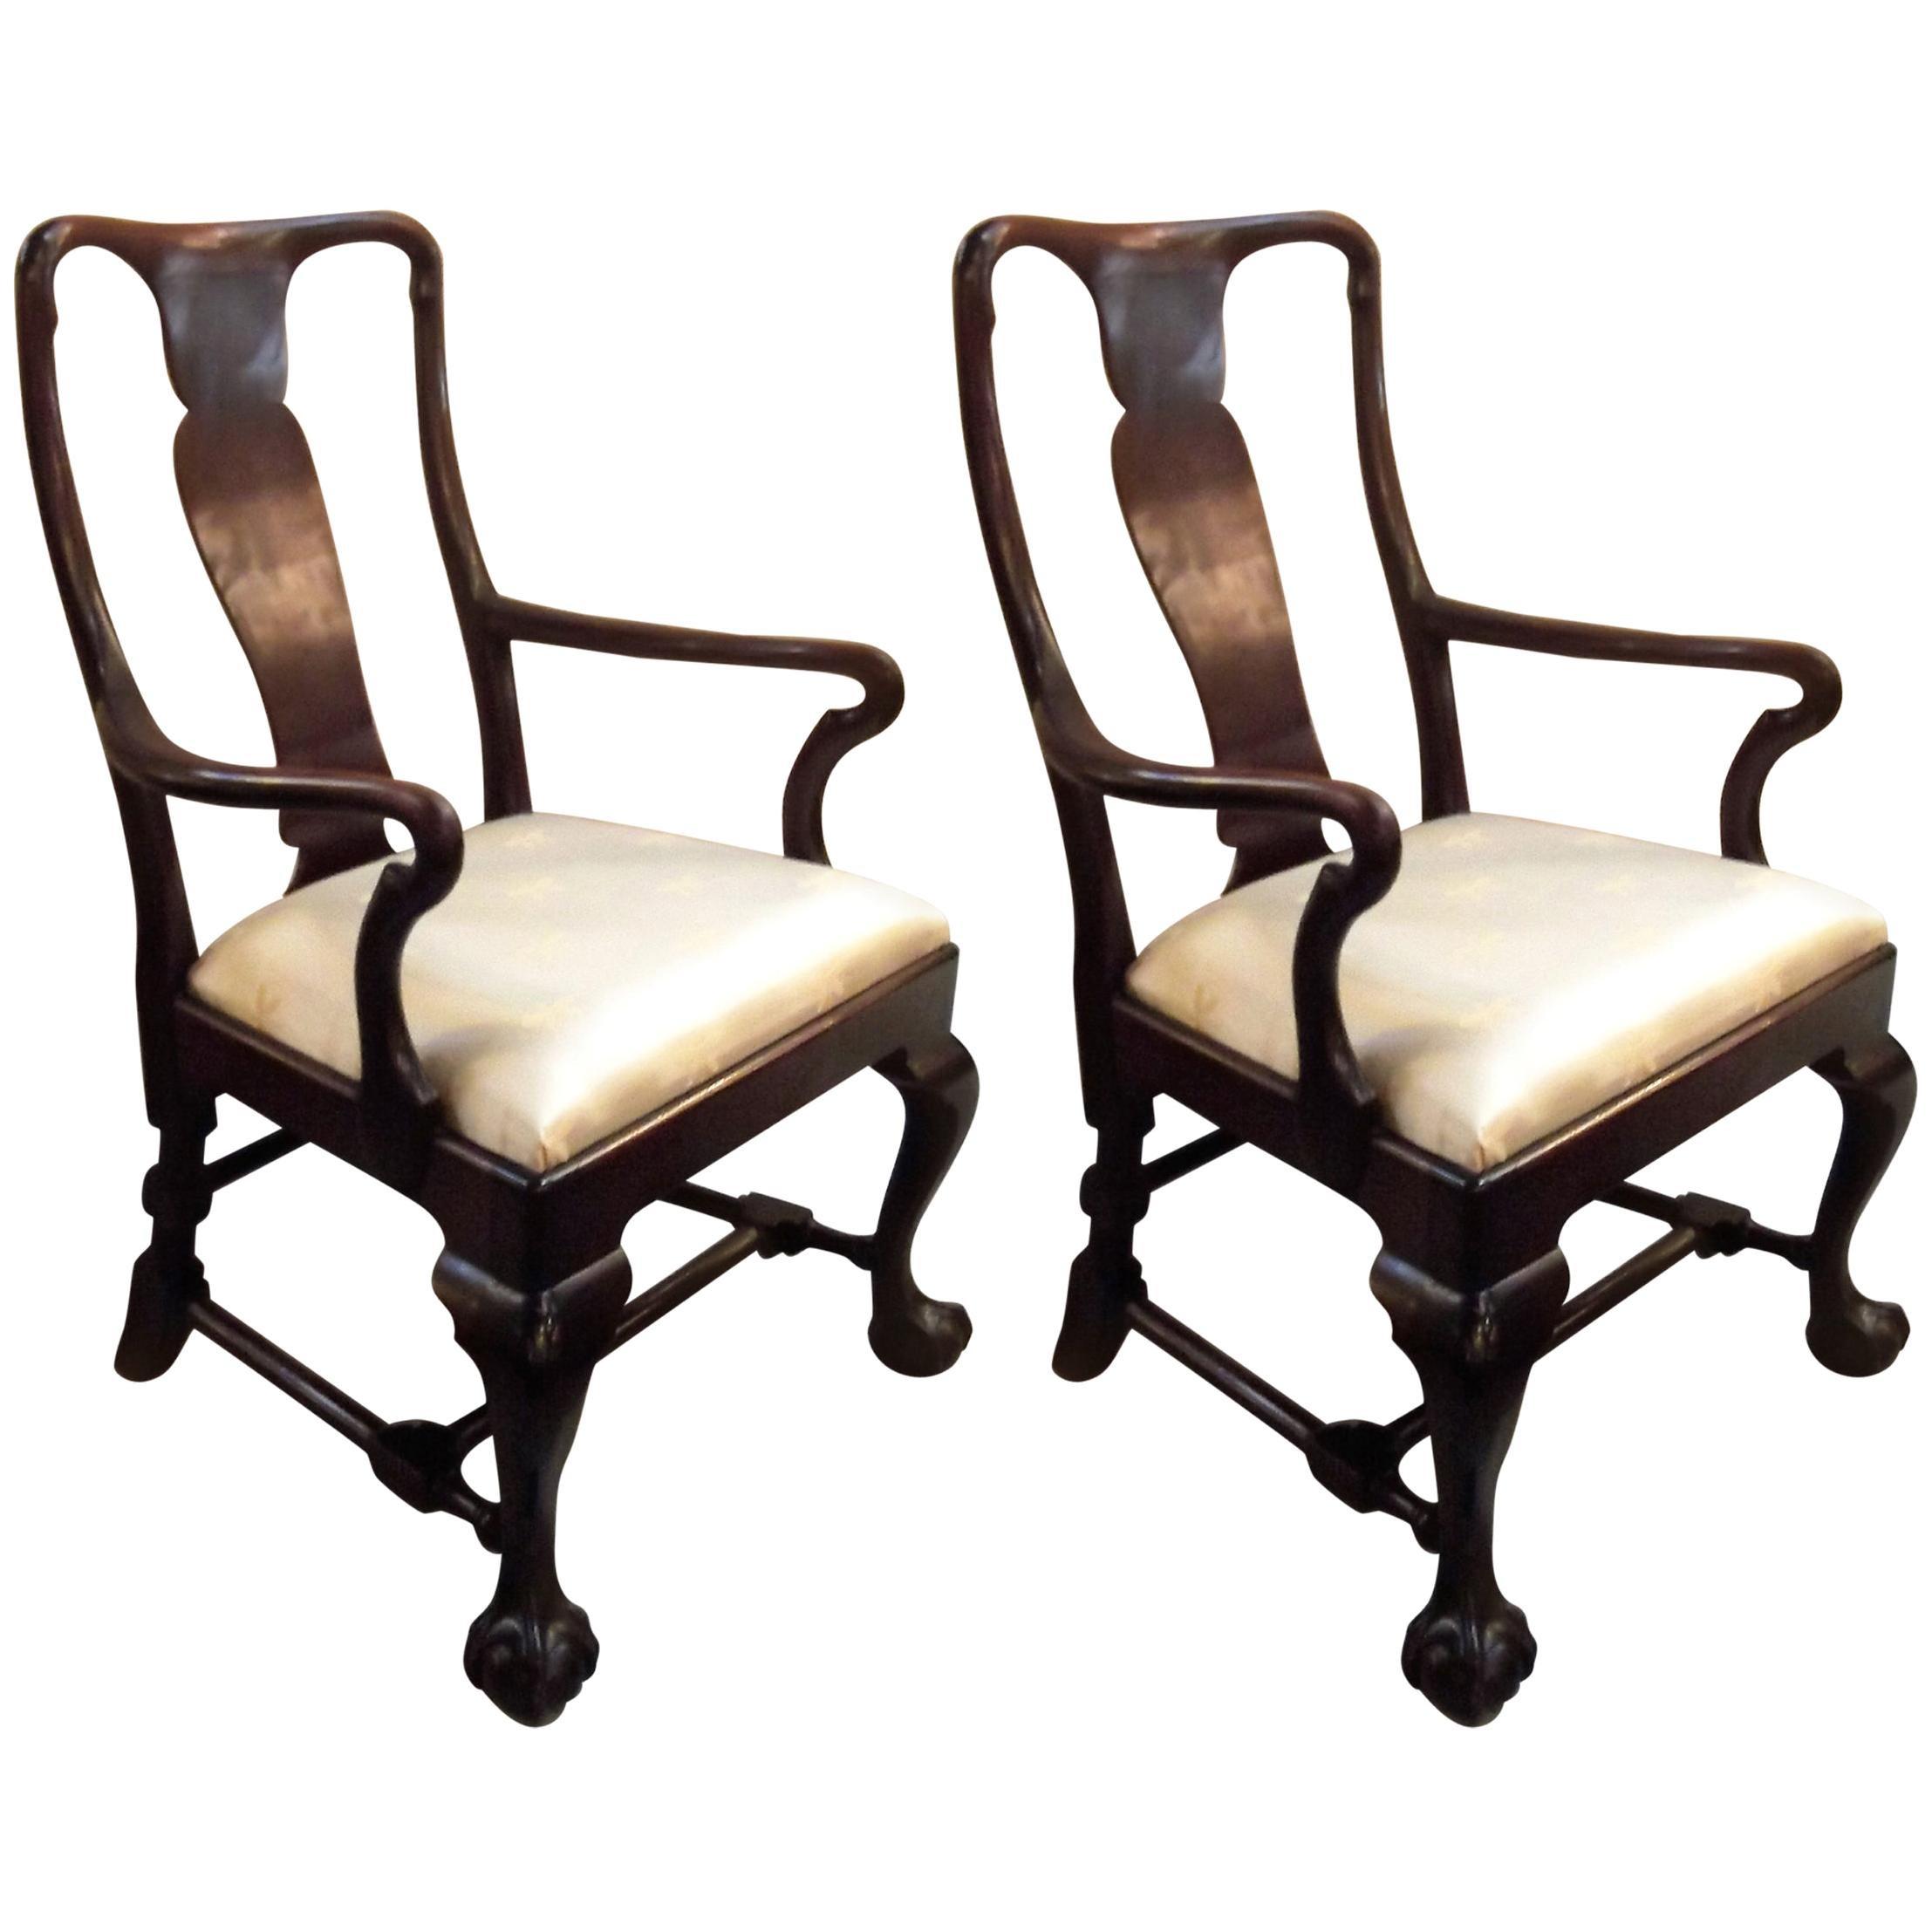 Pair of Antique Mahogany Armchairs 19th Century